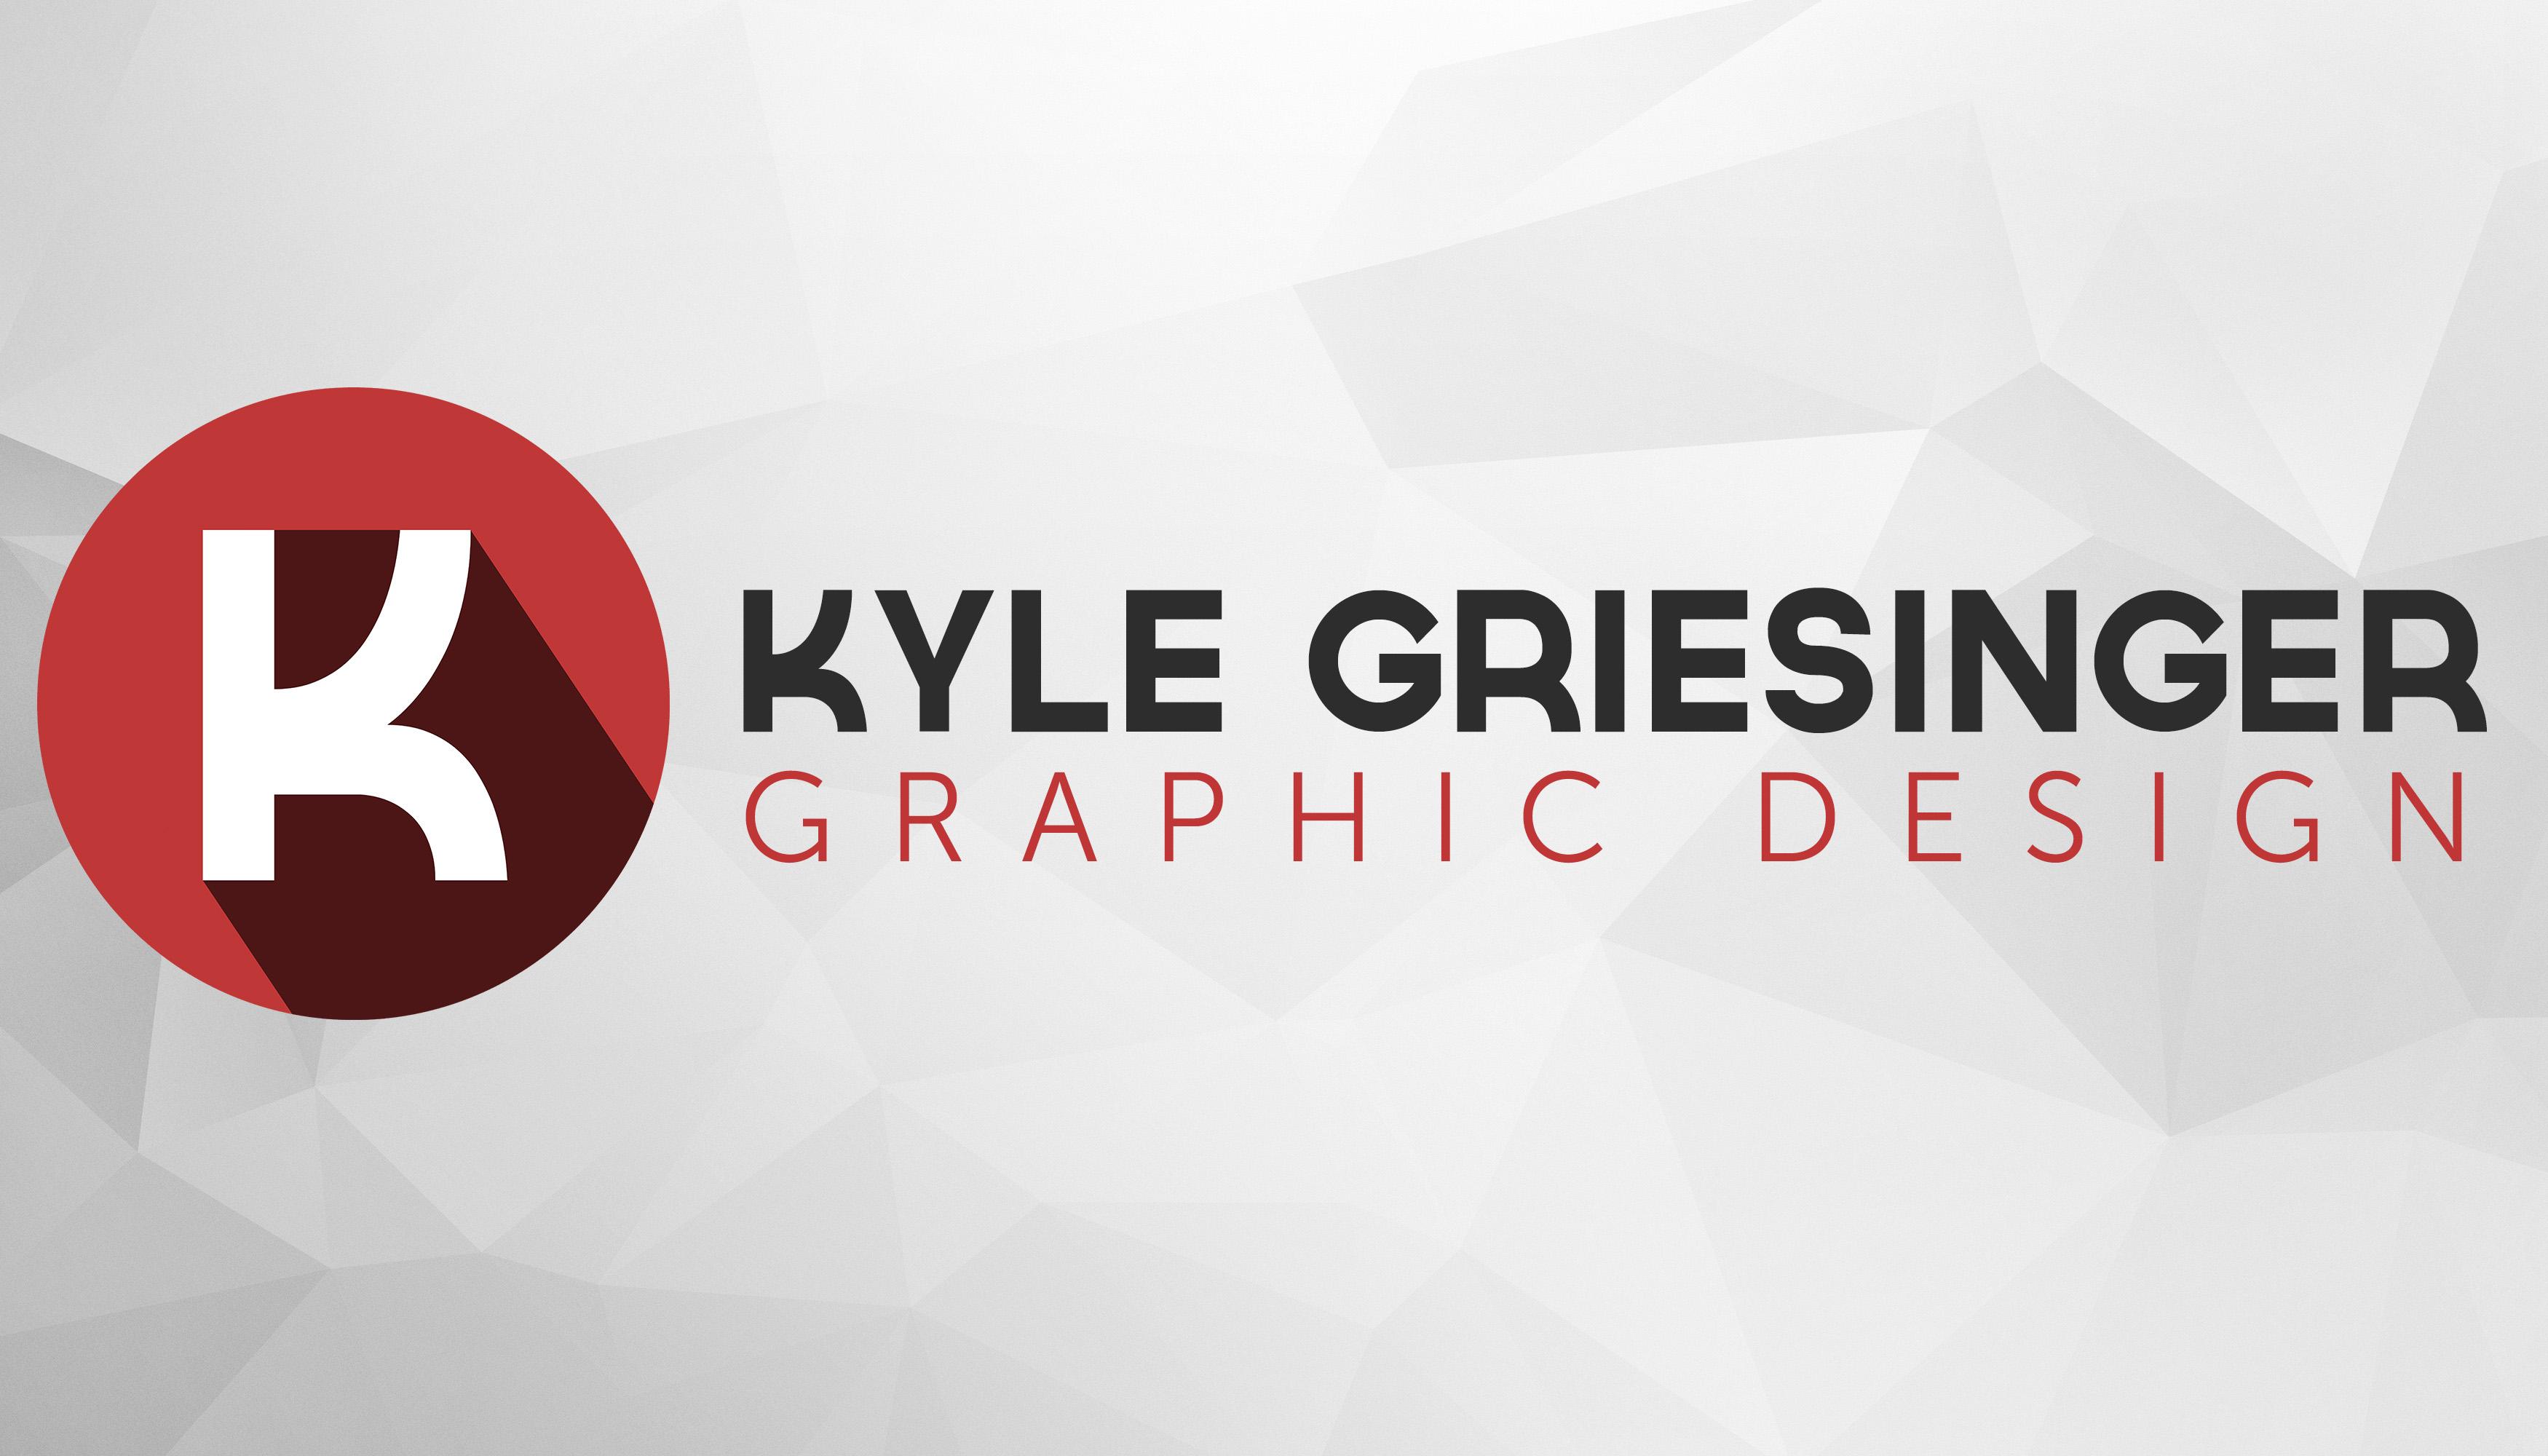 Kyle Griesinger Graphic Design